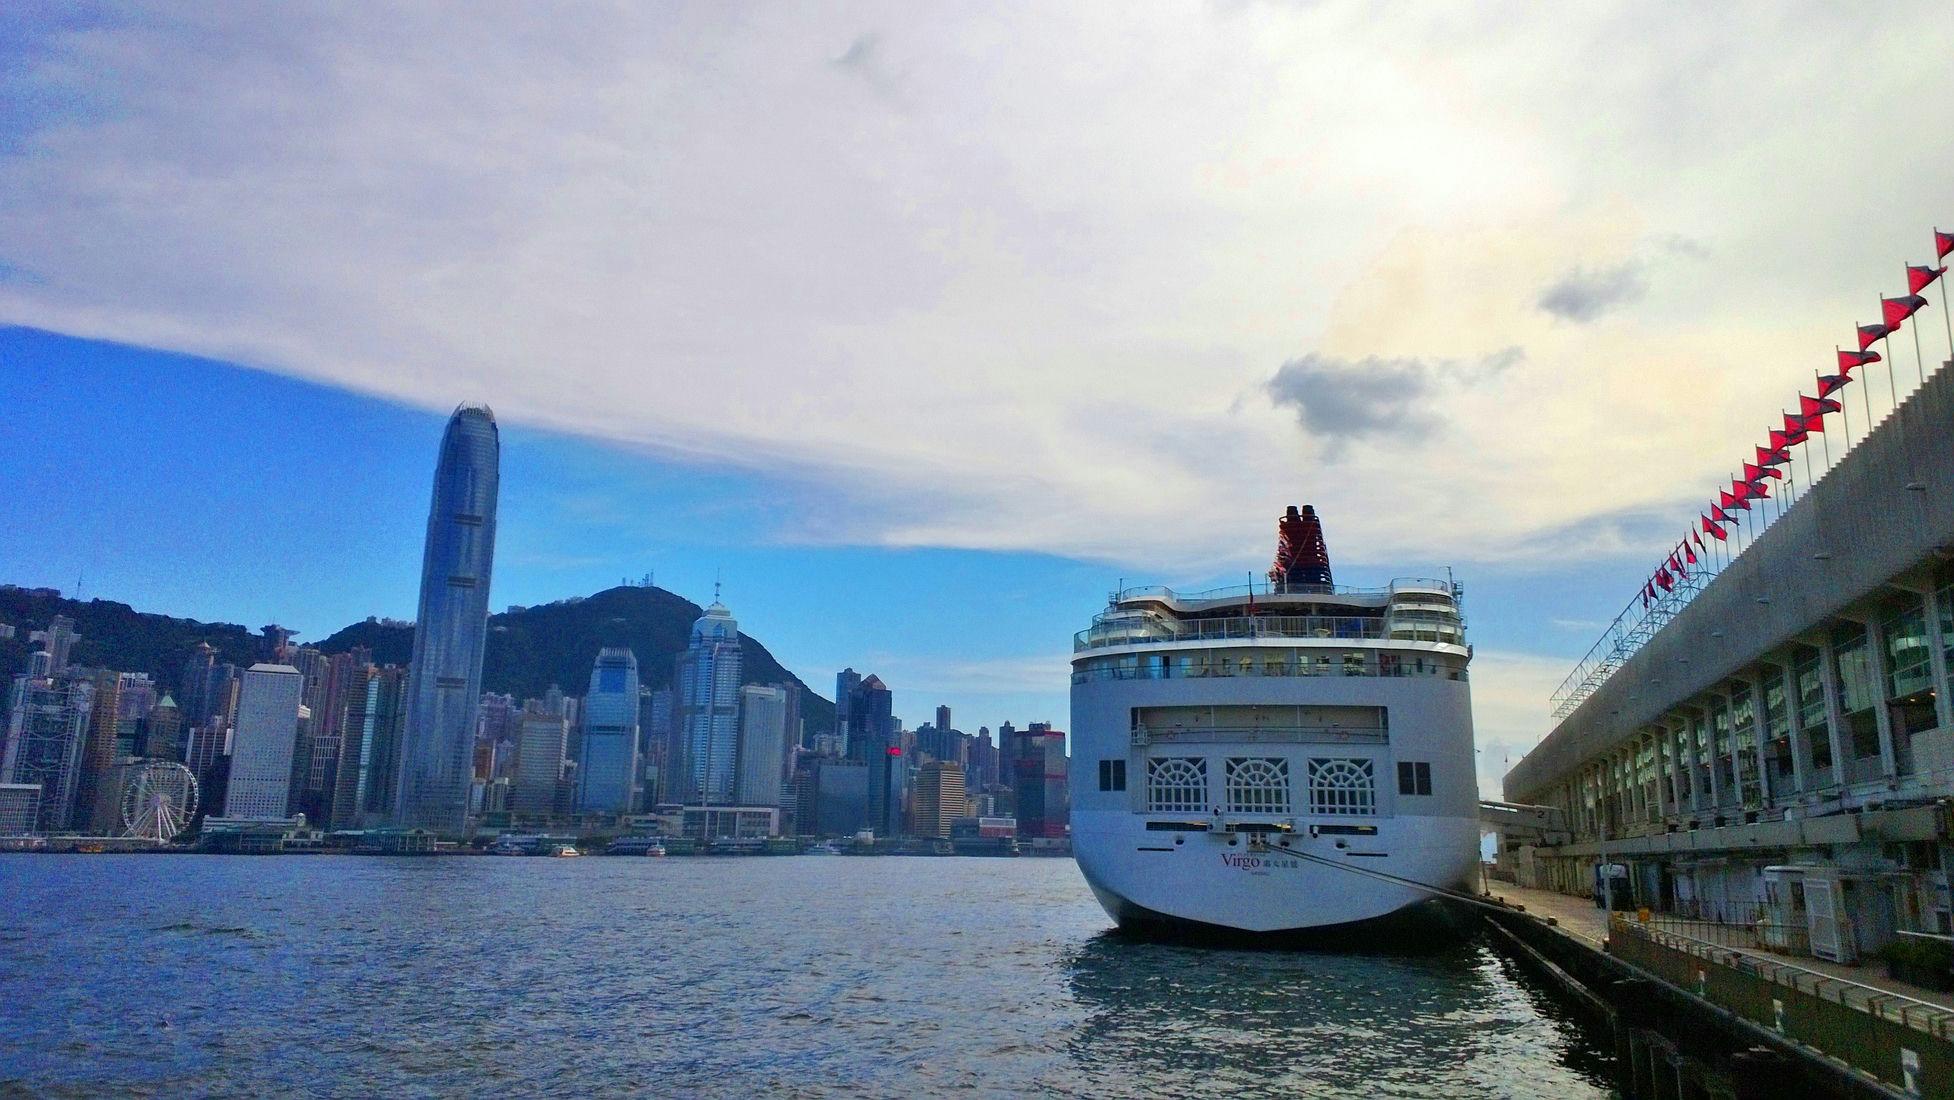 Cruise berths at the Ocean Terminal